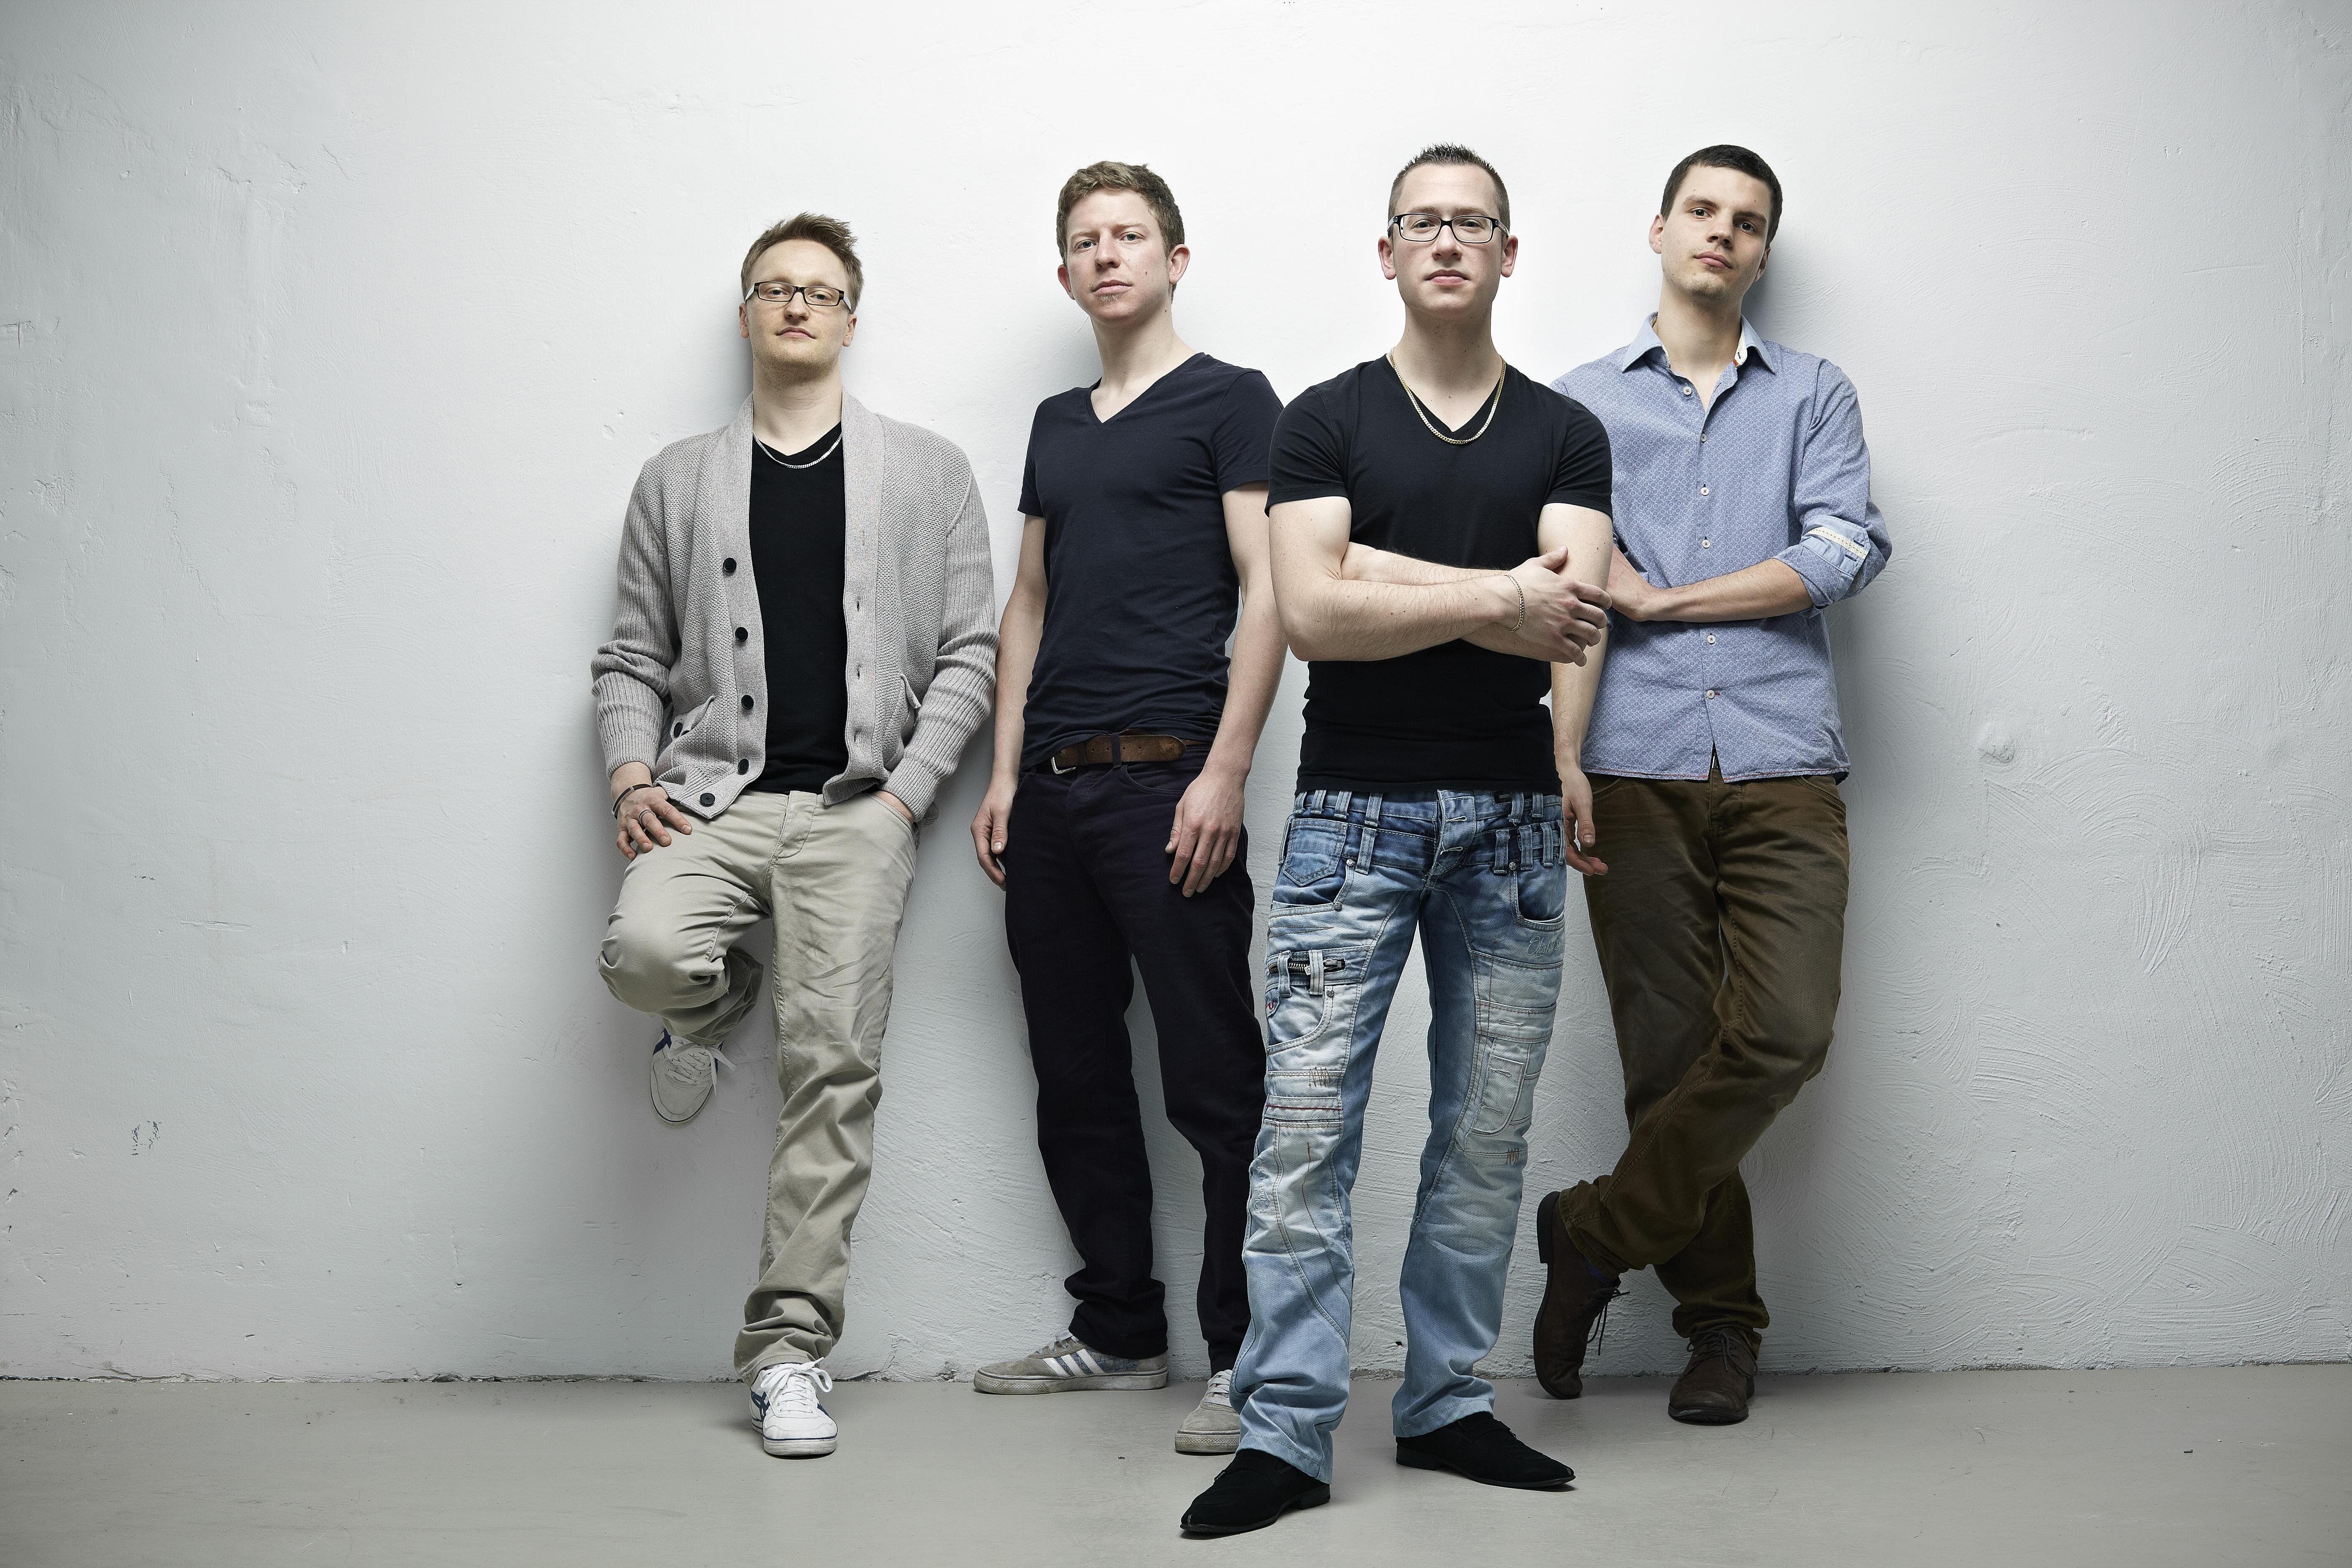 Jazzdiskurs 193 / 11.09.2018 / 19:30 Uhr / Jan Prax Quartett